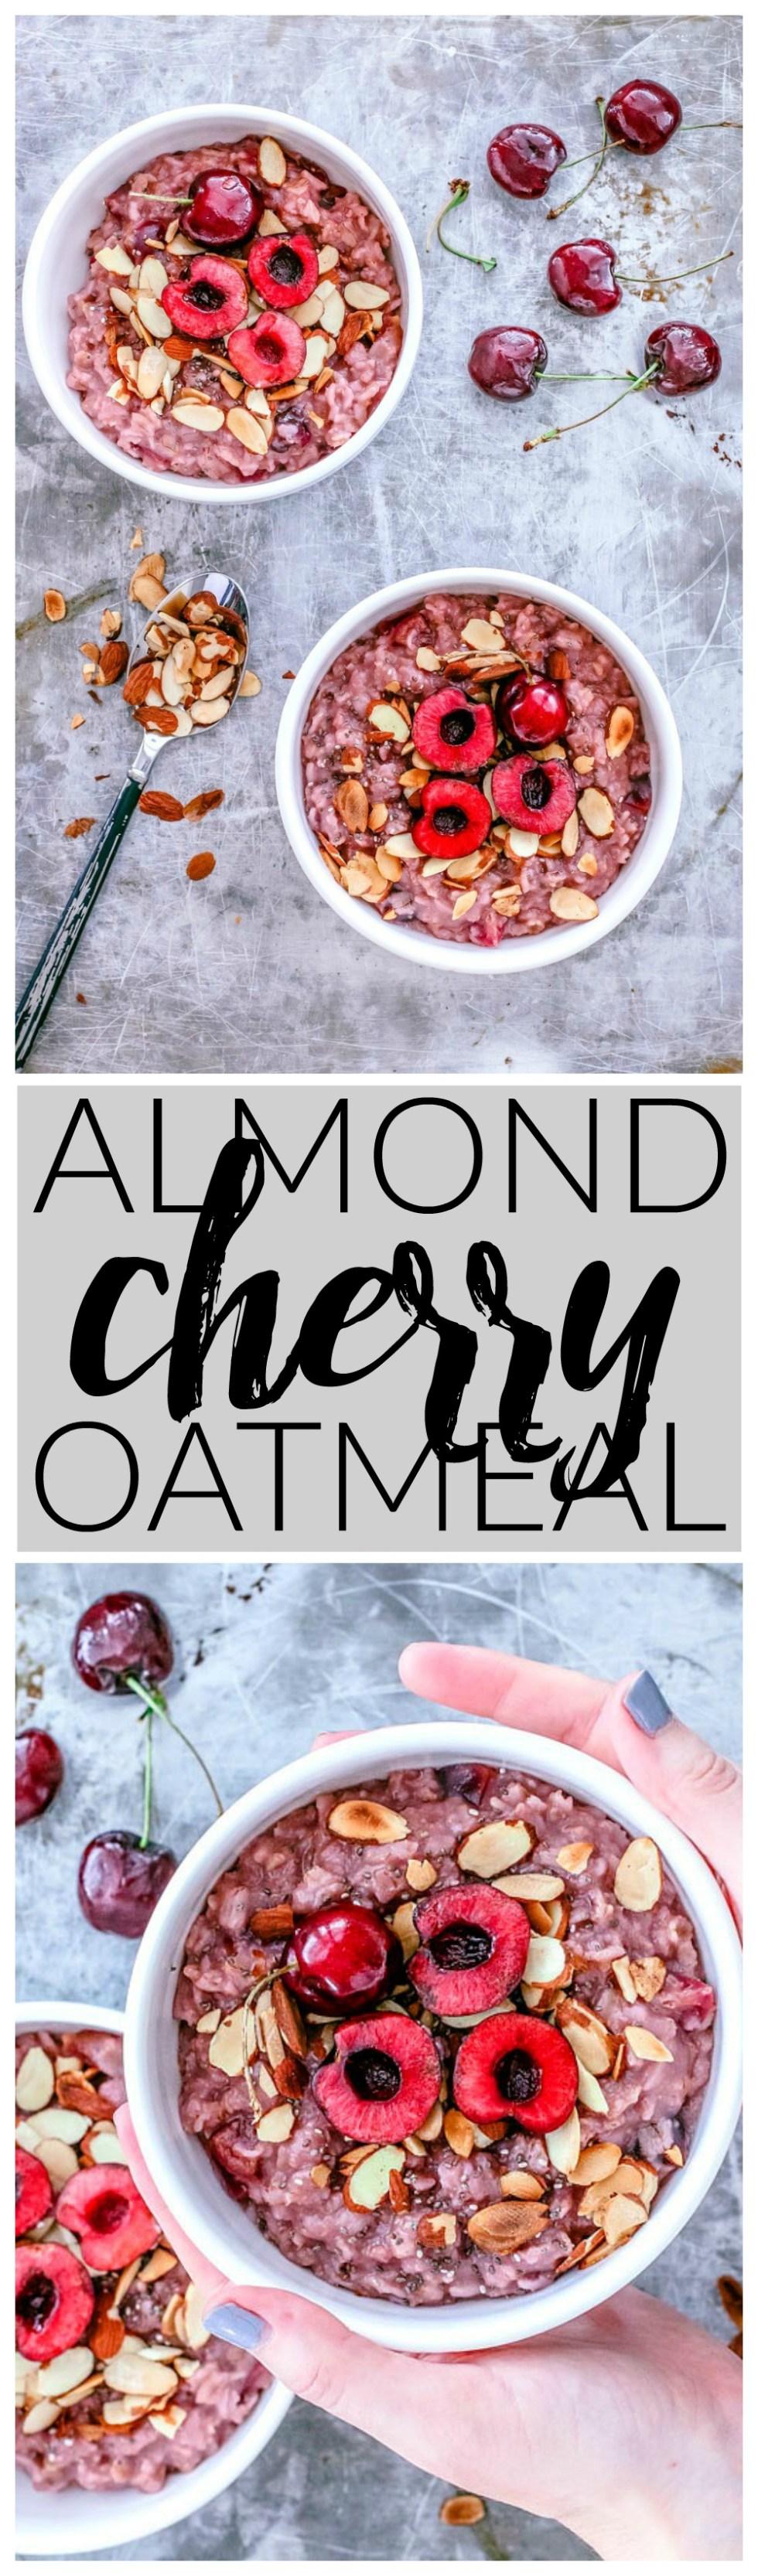 Almond Cherry Oatmeal | Killing Thyme